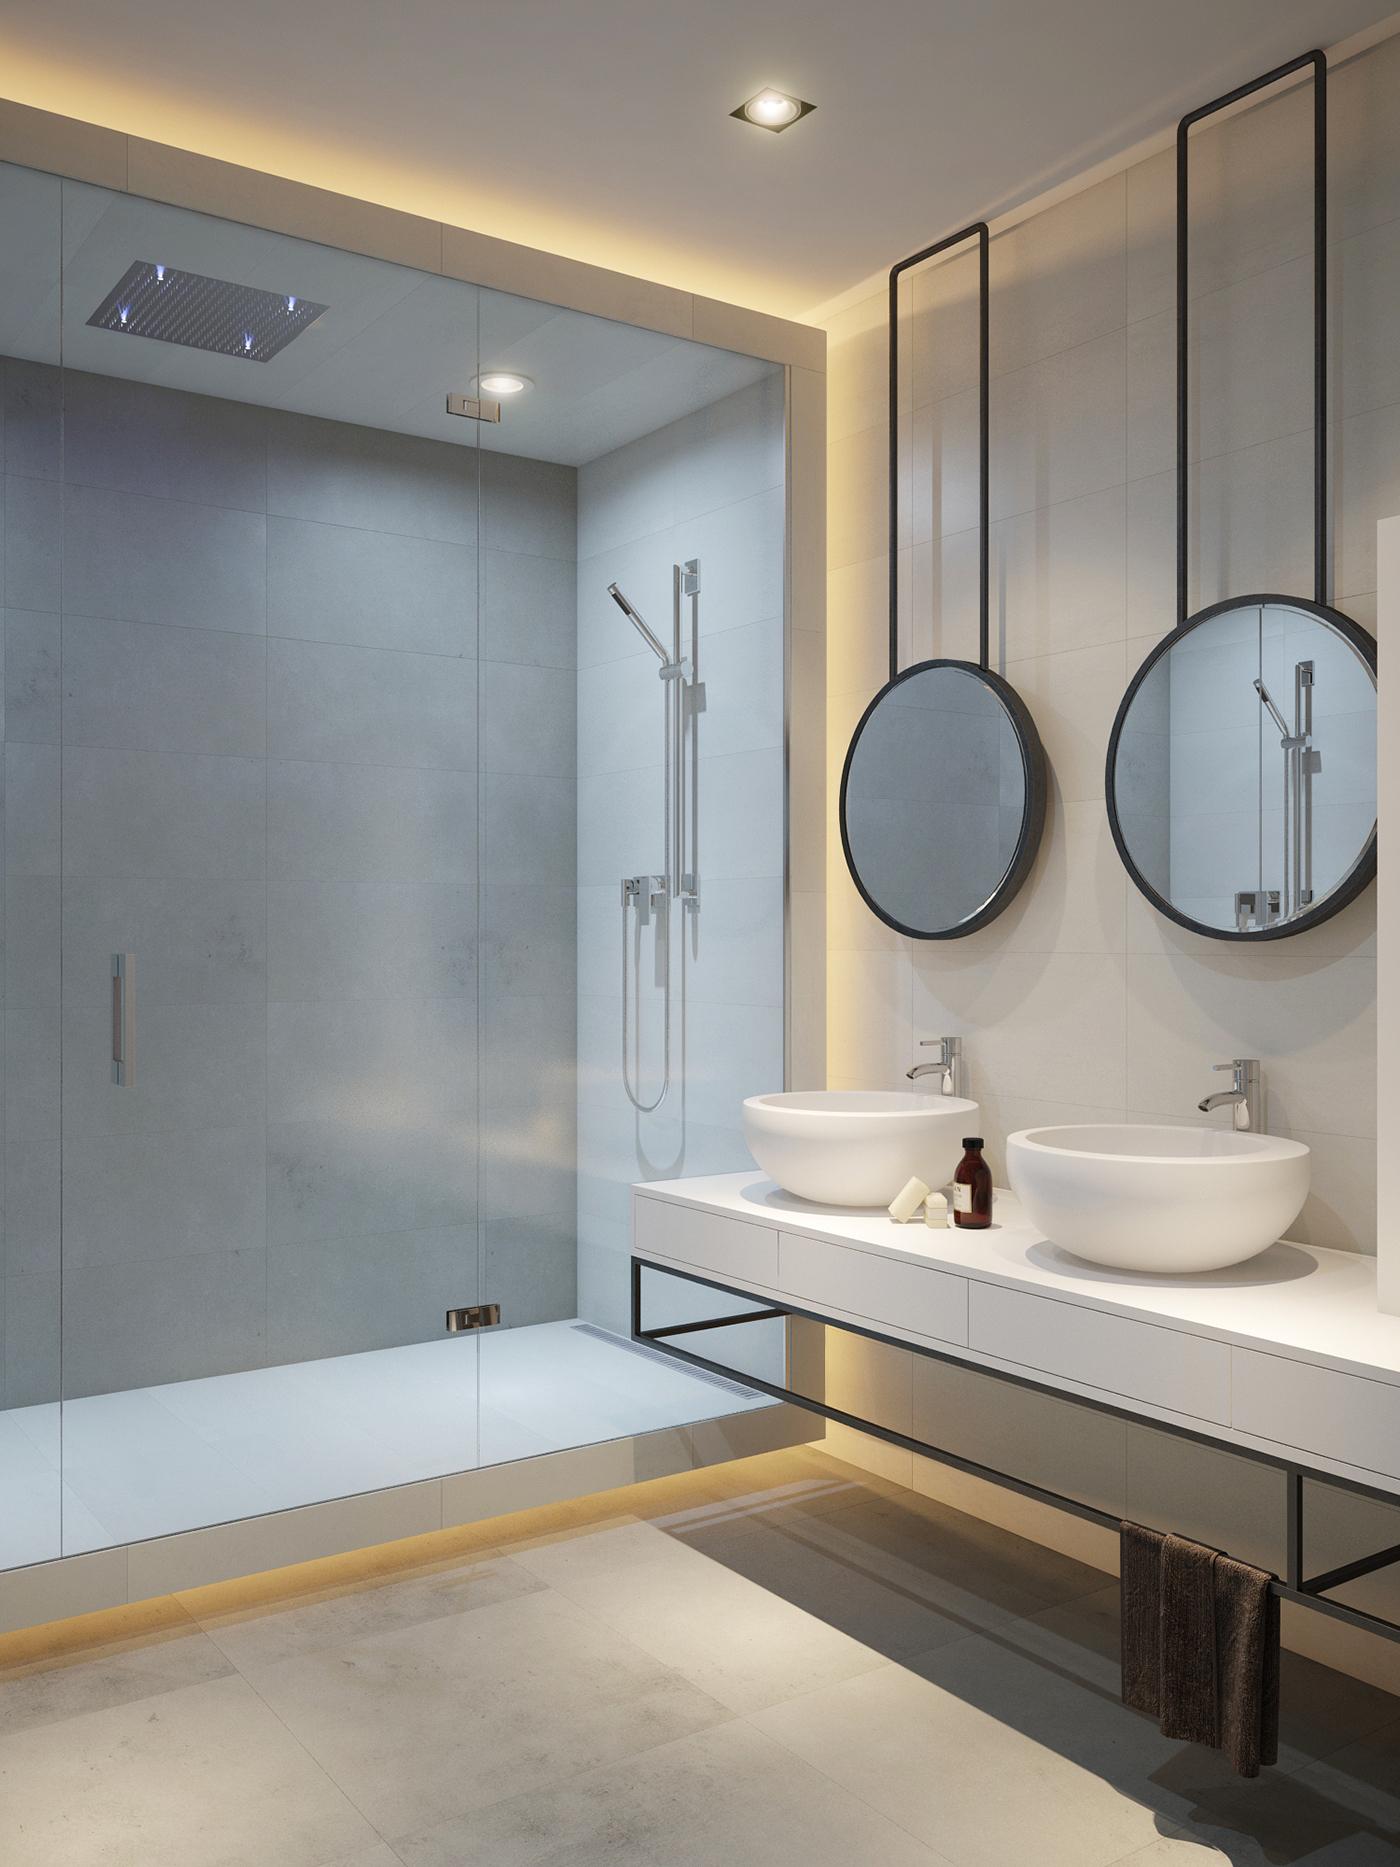 Bathroom visualization on Behance